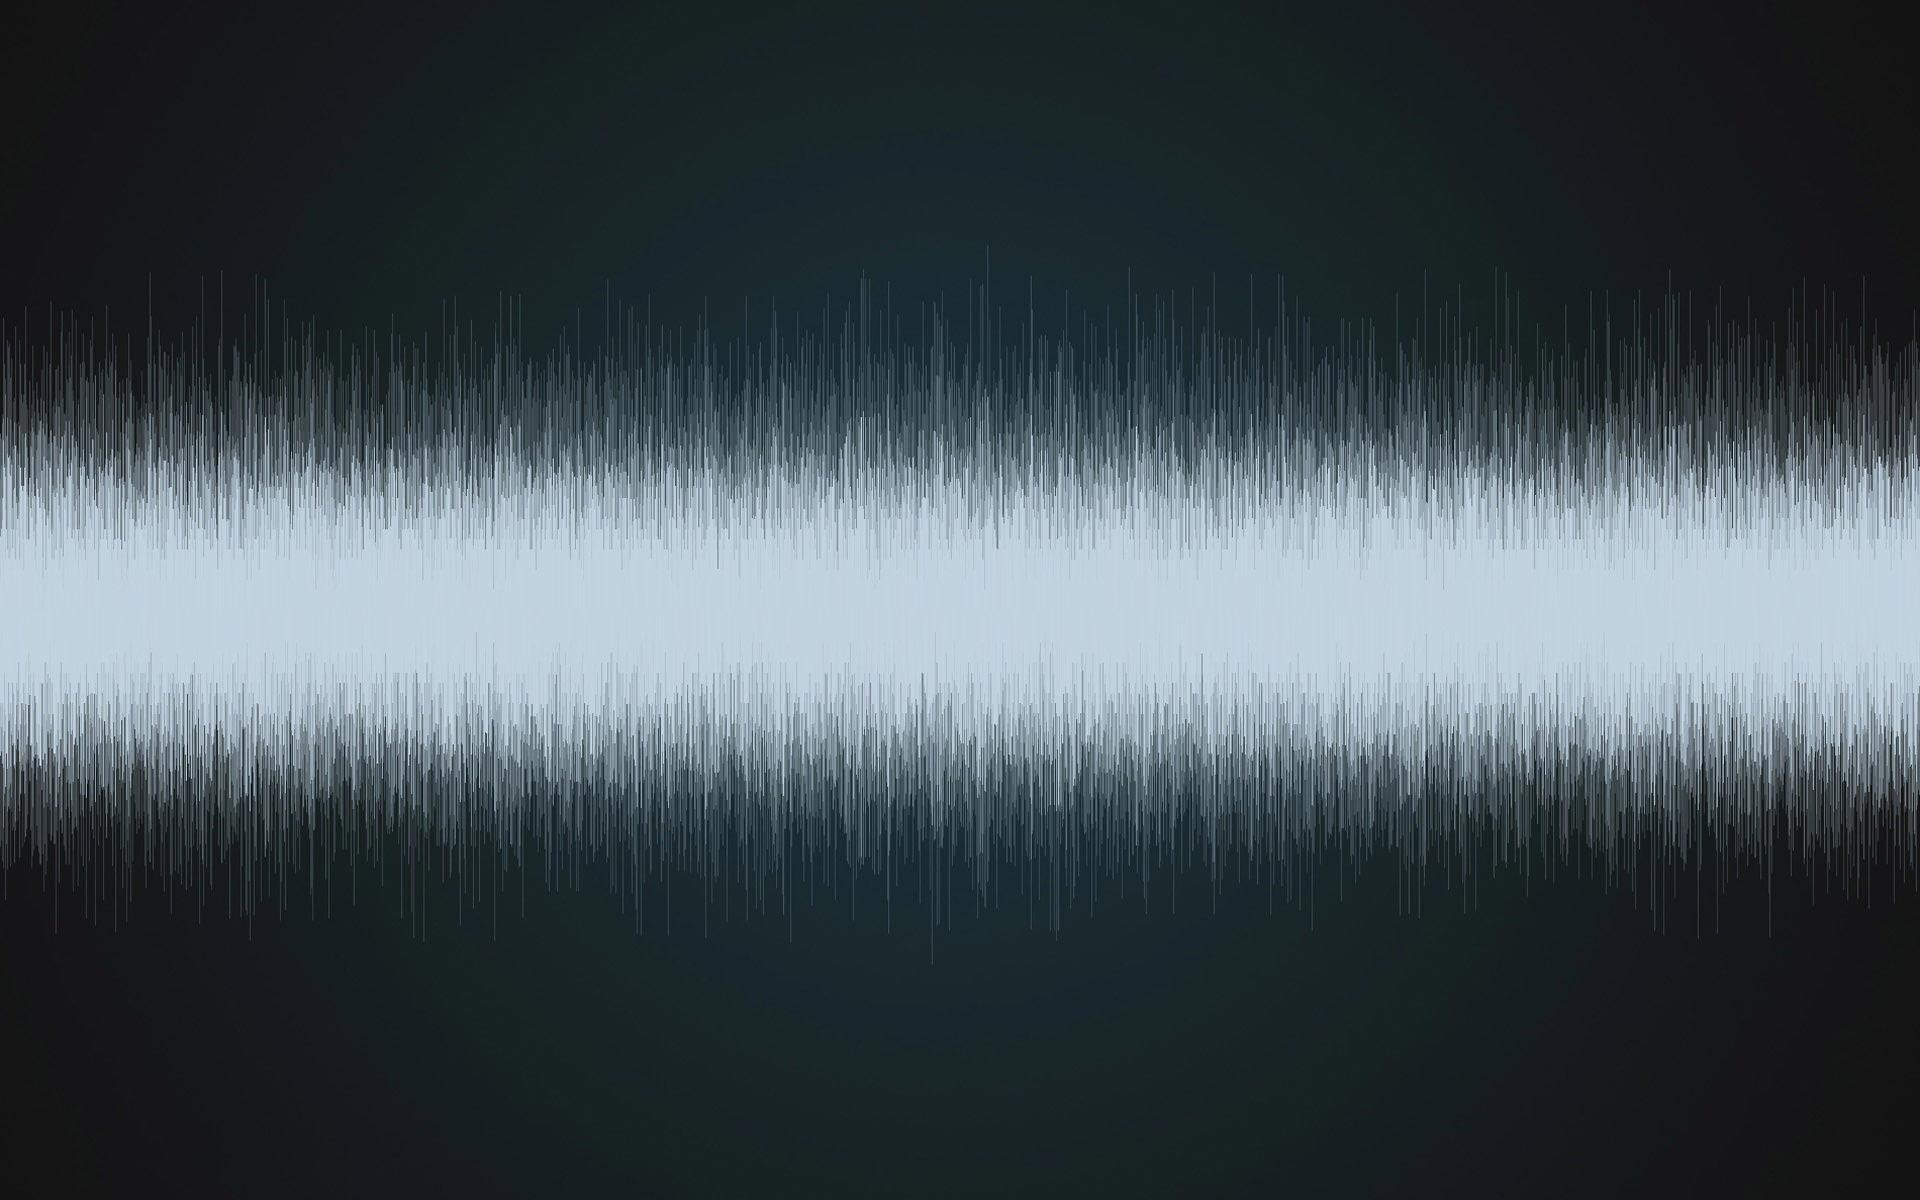 Sound waves wallpaper #194